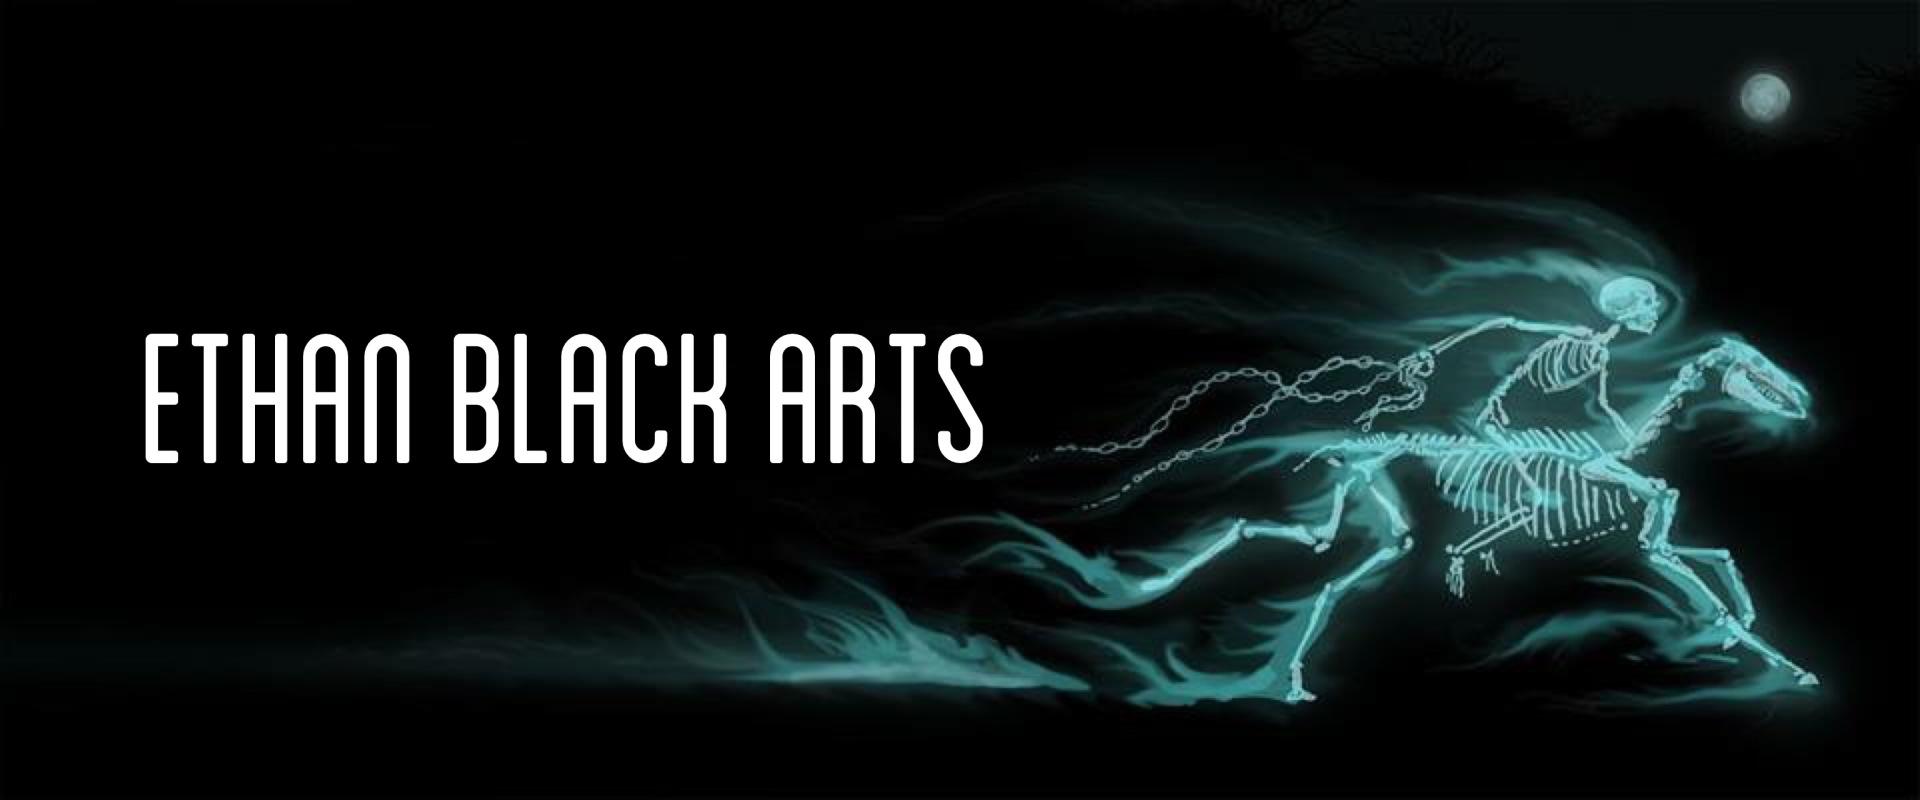 Ethan Black Art